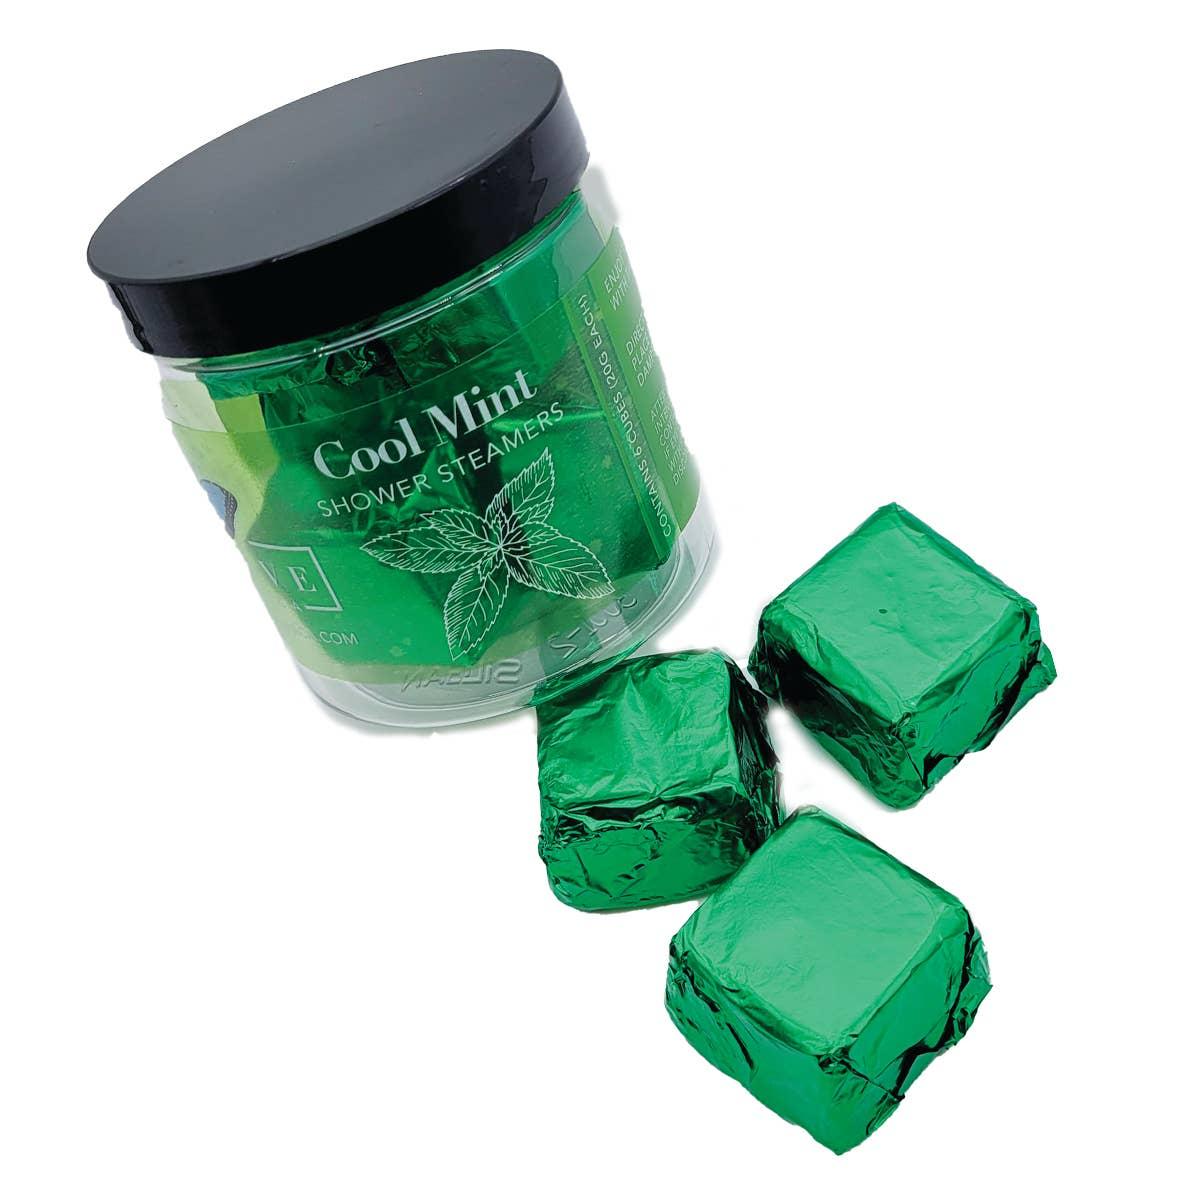 Evolve - Shower Steamers - Cool Mint (6 per Jar) | Trada Marketplace